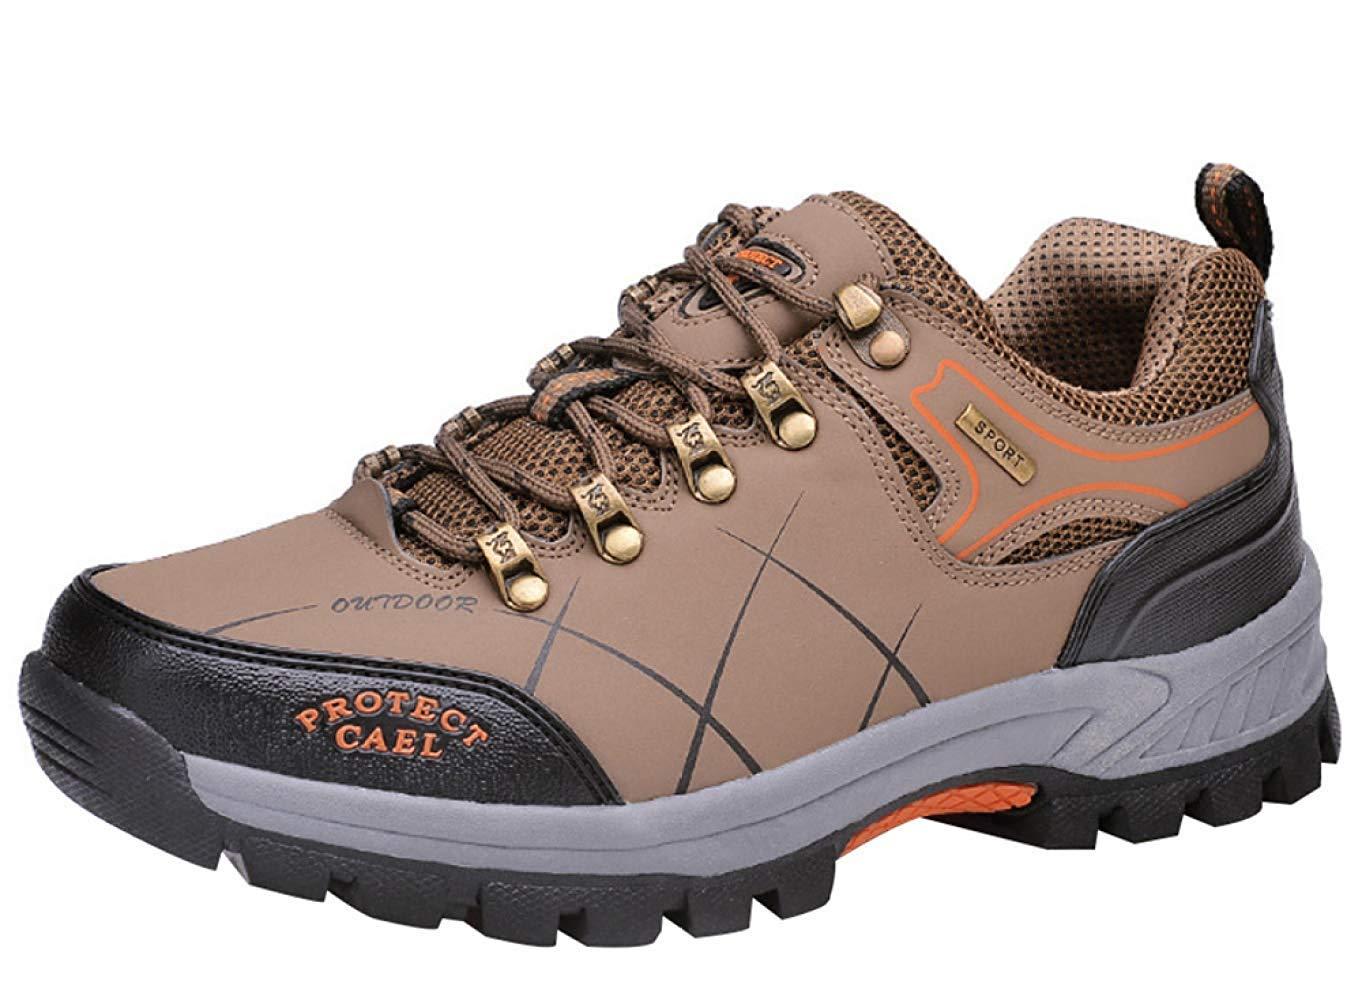 HhGold Männer Wanderschuhe Stiefel Leder Wanderschuhe Turnschuhe Für Outdoor Trekking Training Beiläufige Arbeit (Farbe : 7, Größe : 39EU)